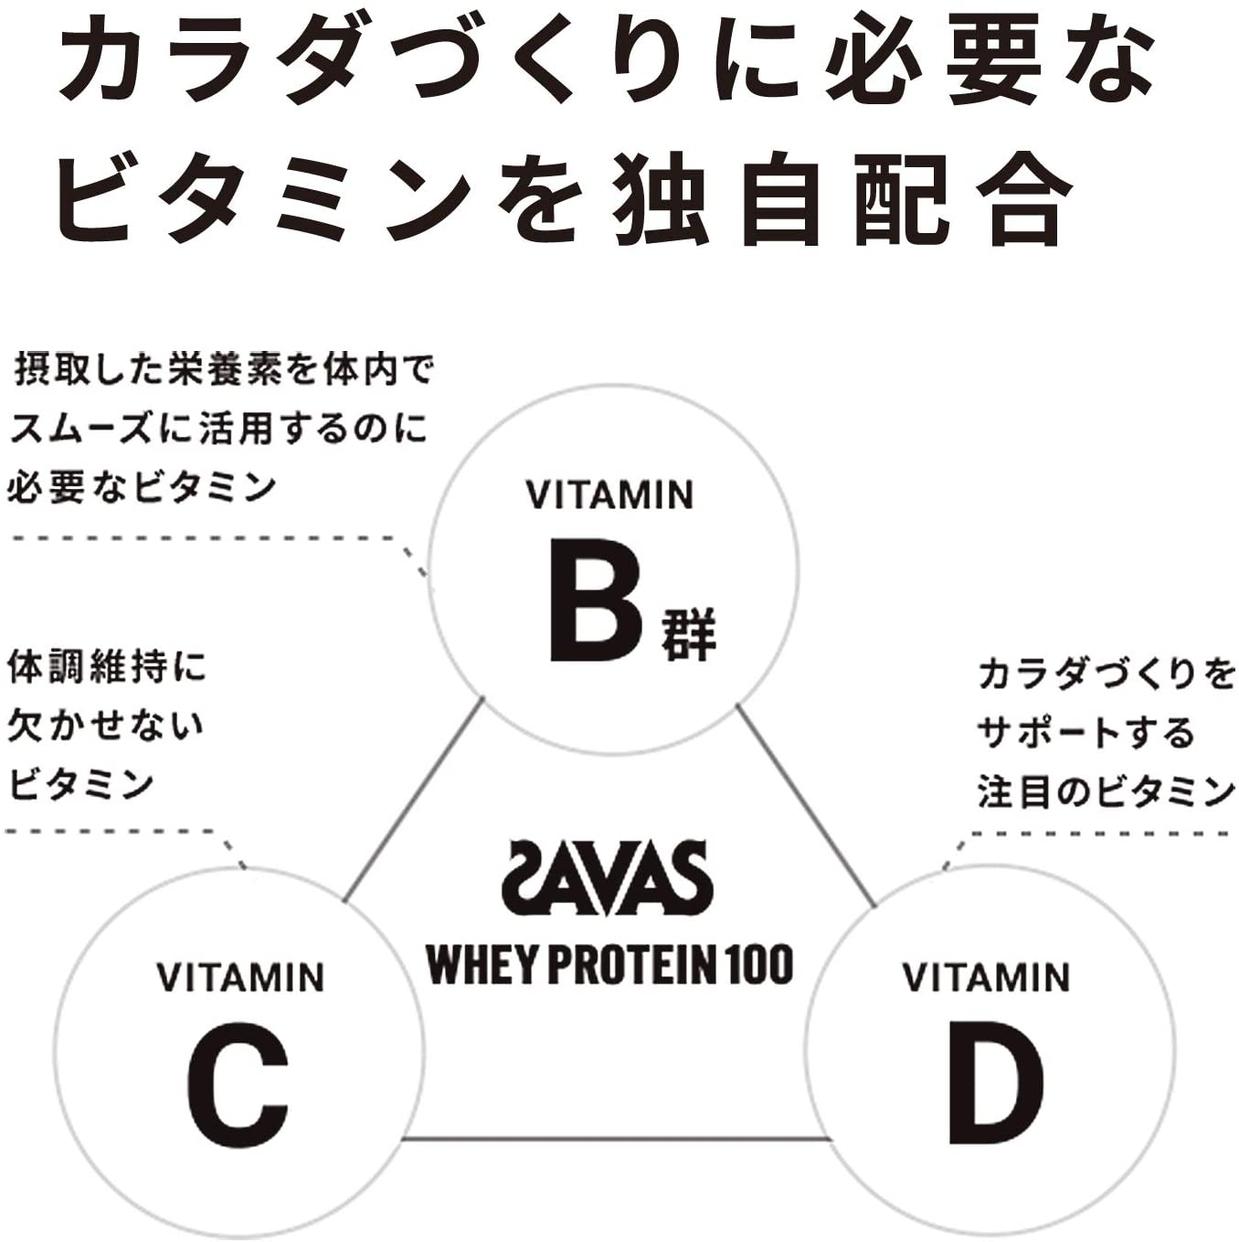 SAVAS(ザバス) ホエイプロテイン100の商品画像5